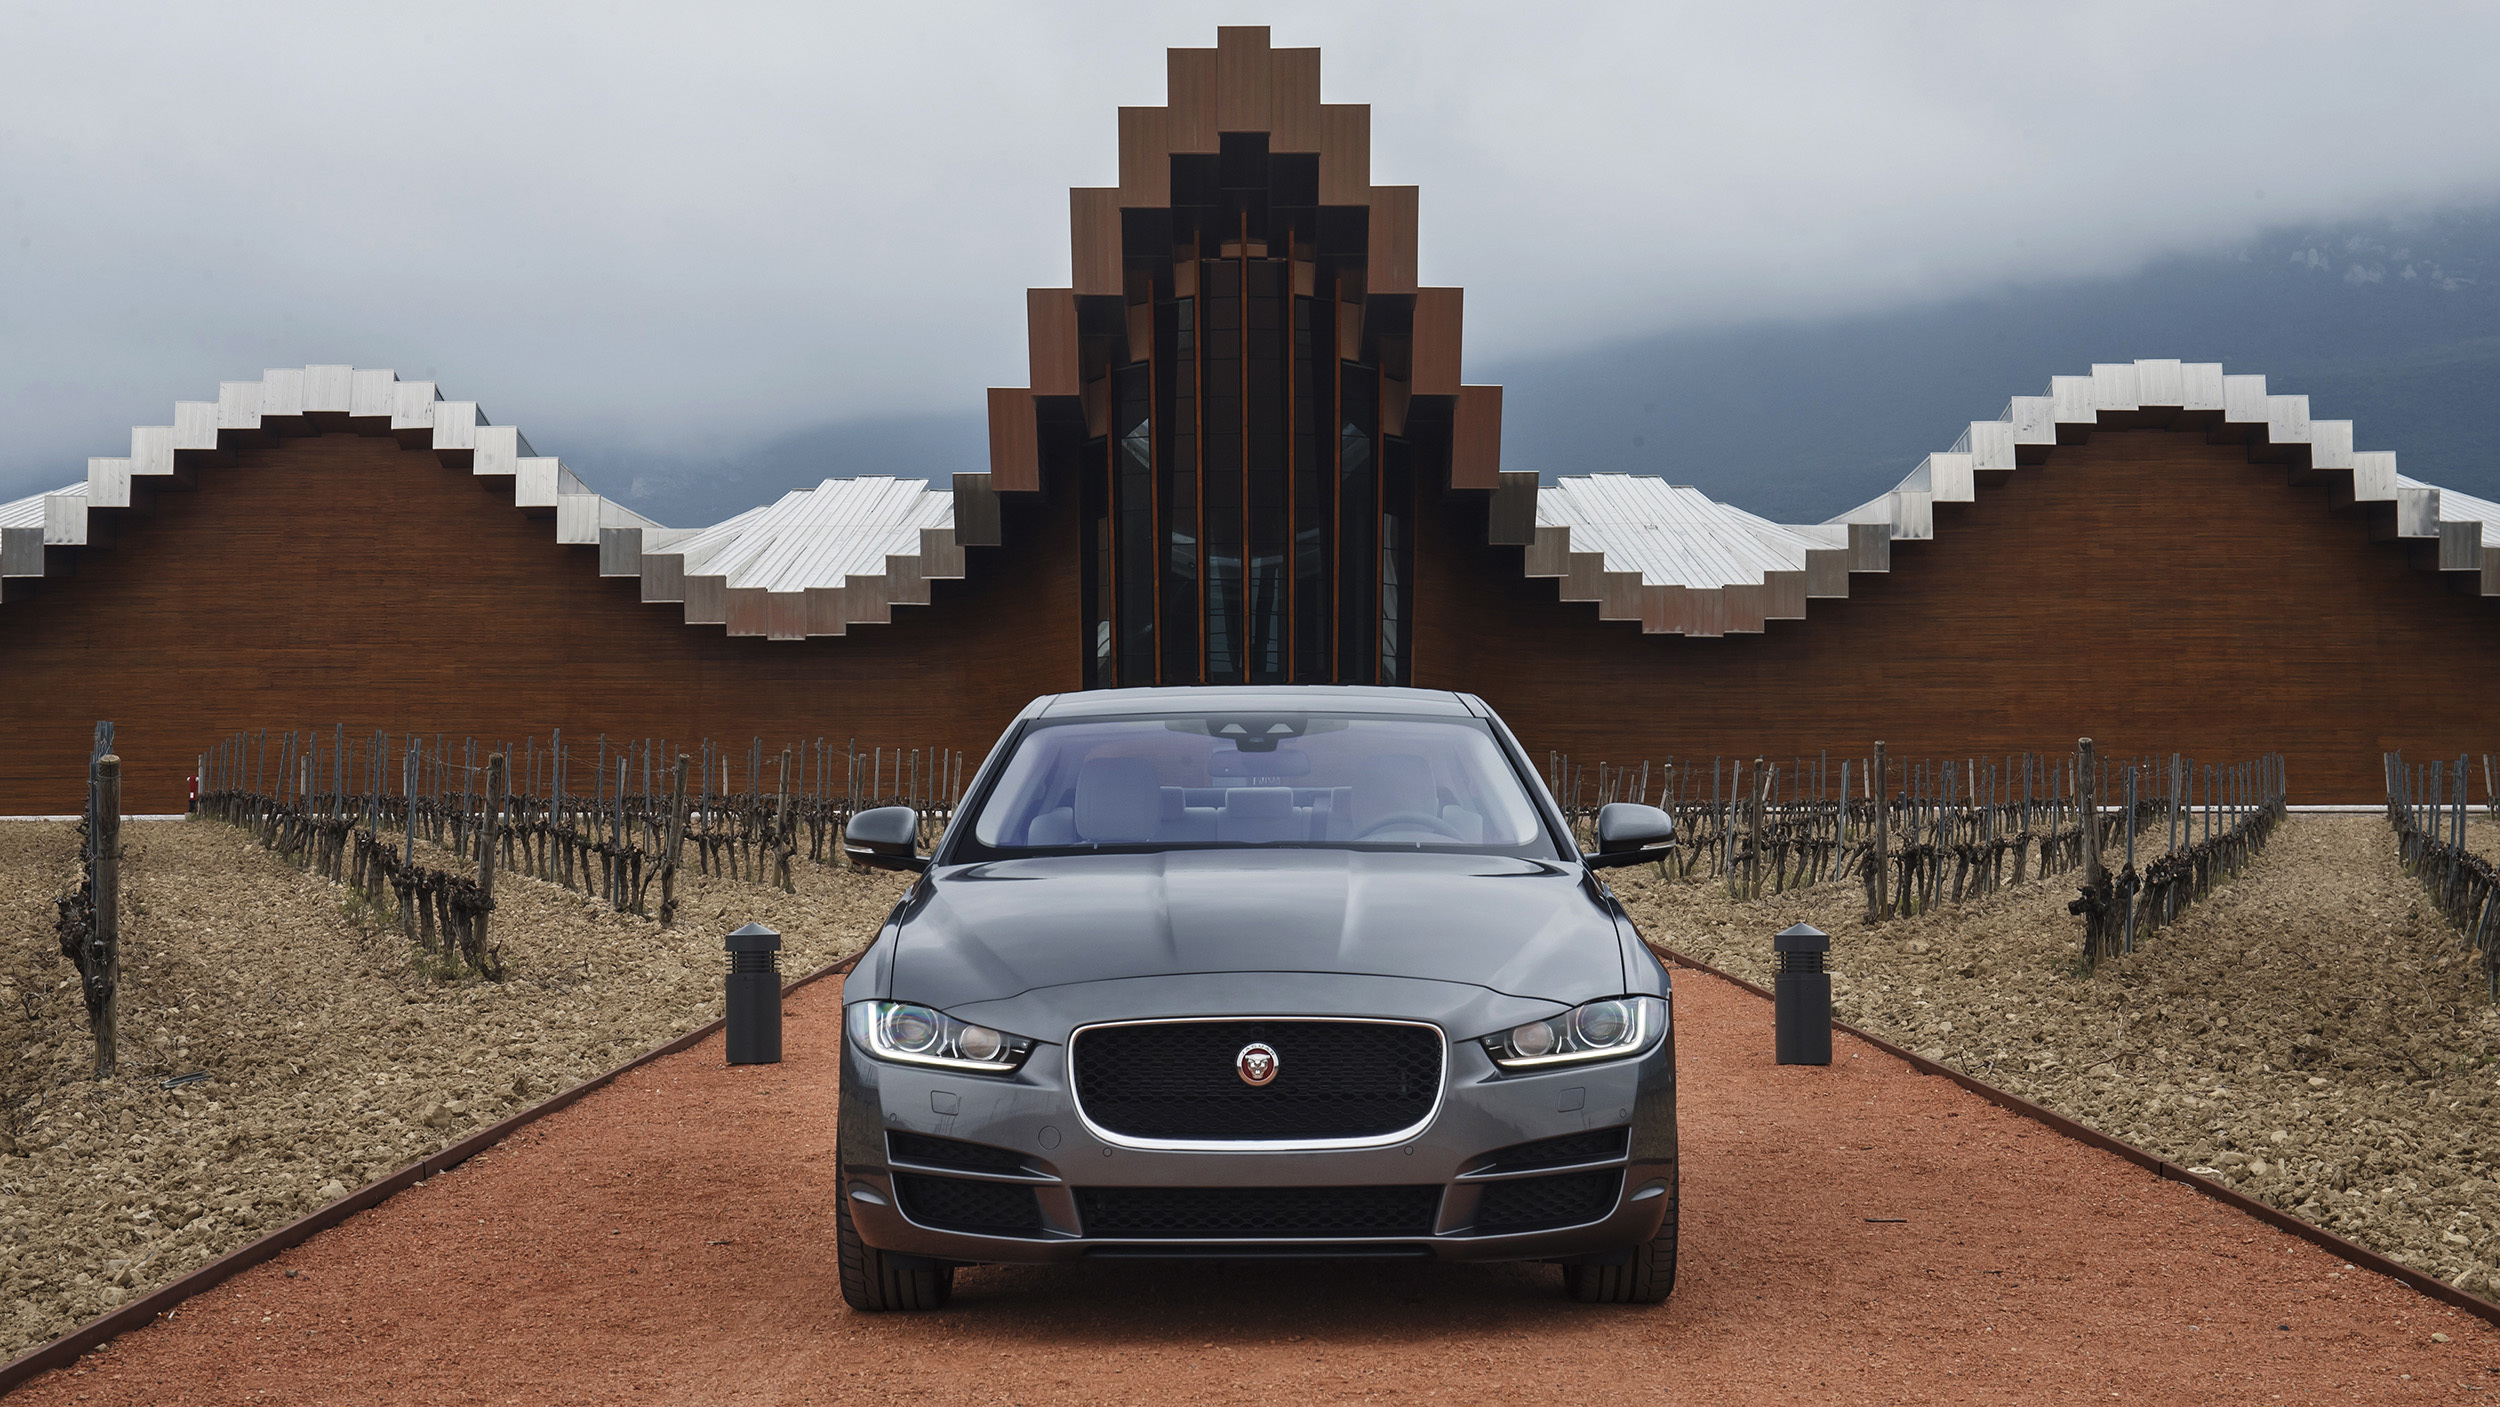 2017 Jaguar Xe Exterior Front (View 31 of 32)